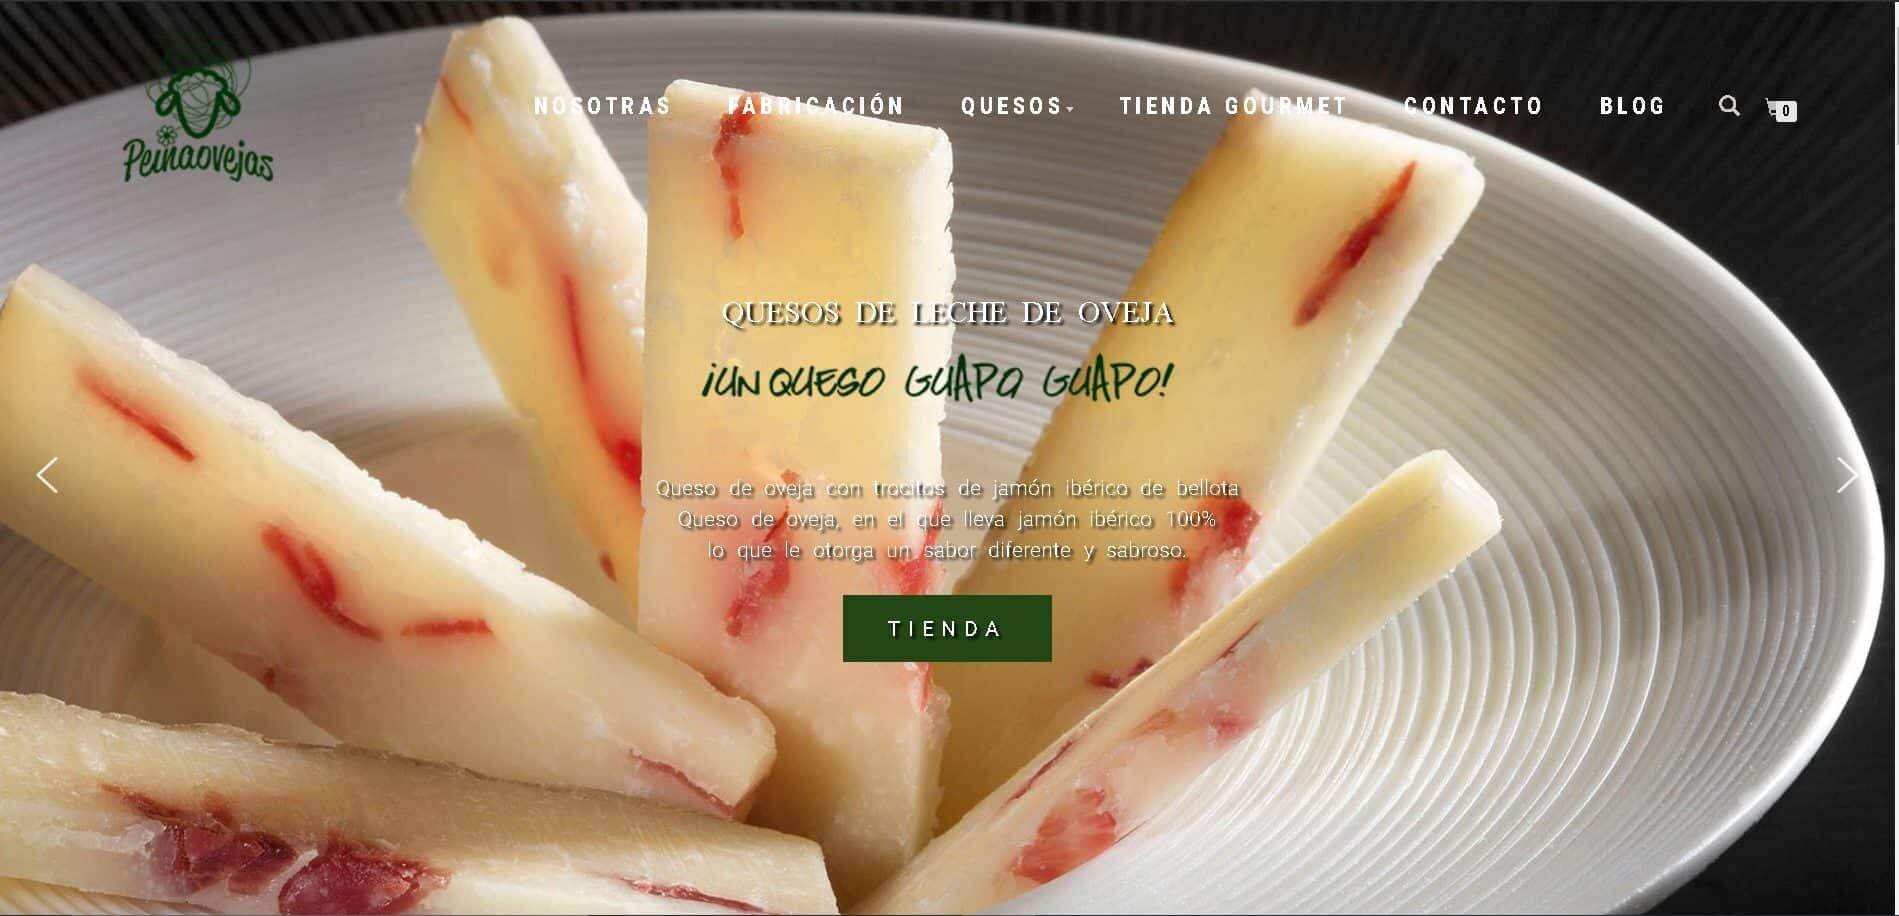 Peinaovejas-diseño-página-web